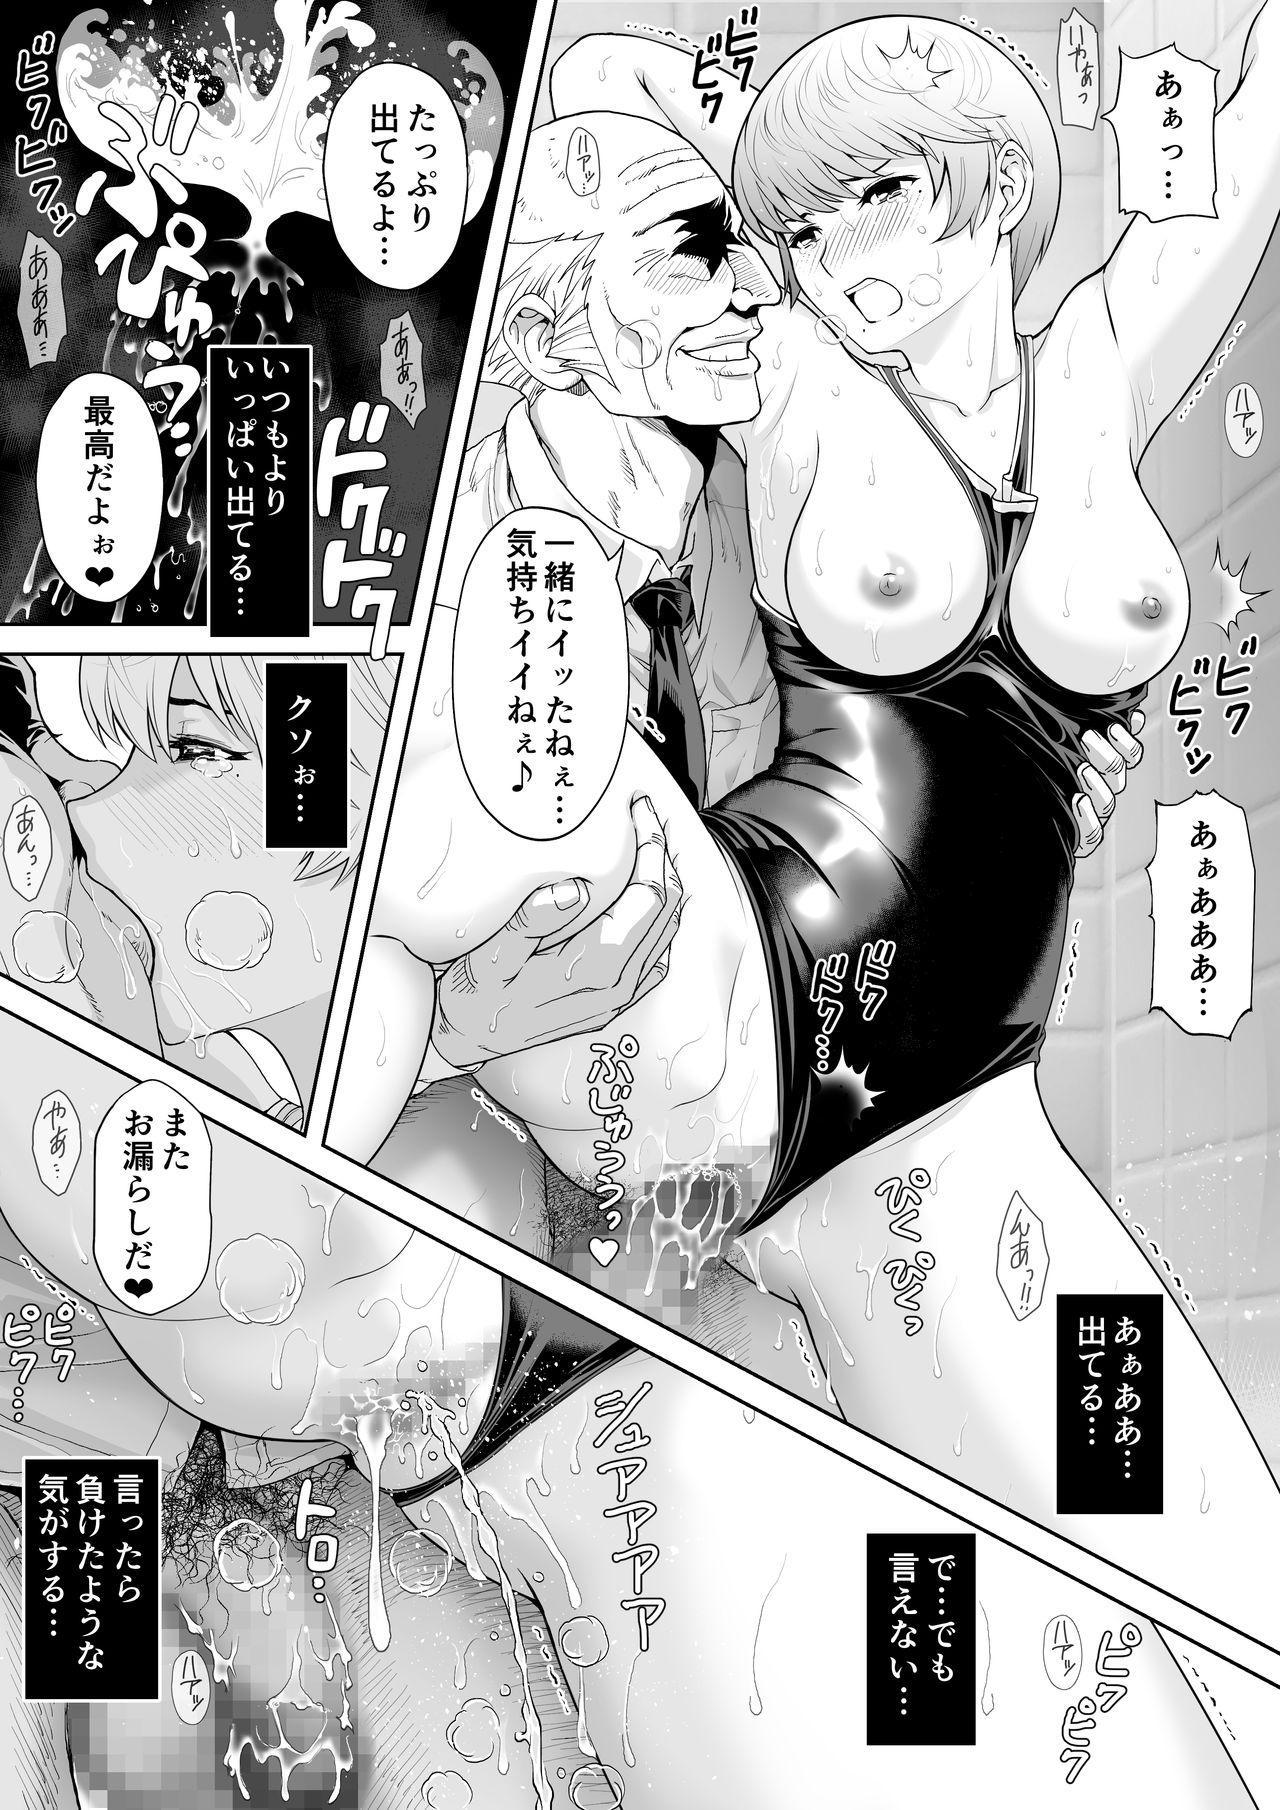 Namaiki mmusume ni tsuyo ● ikīki jugyō 61